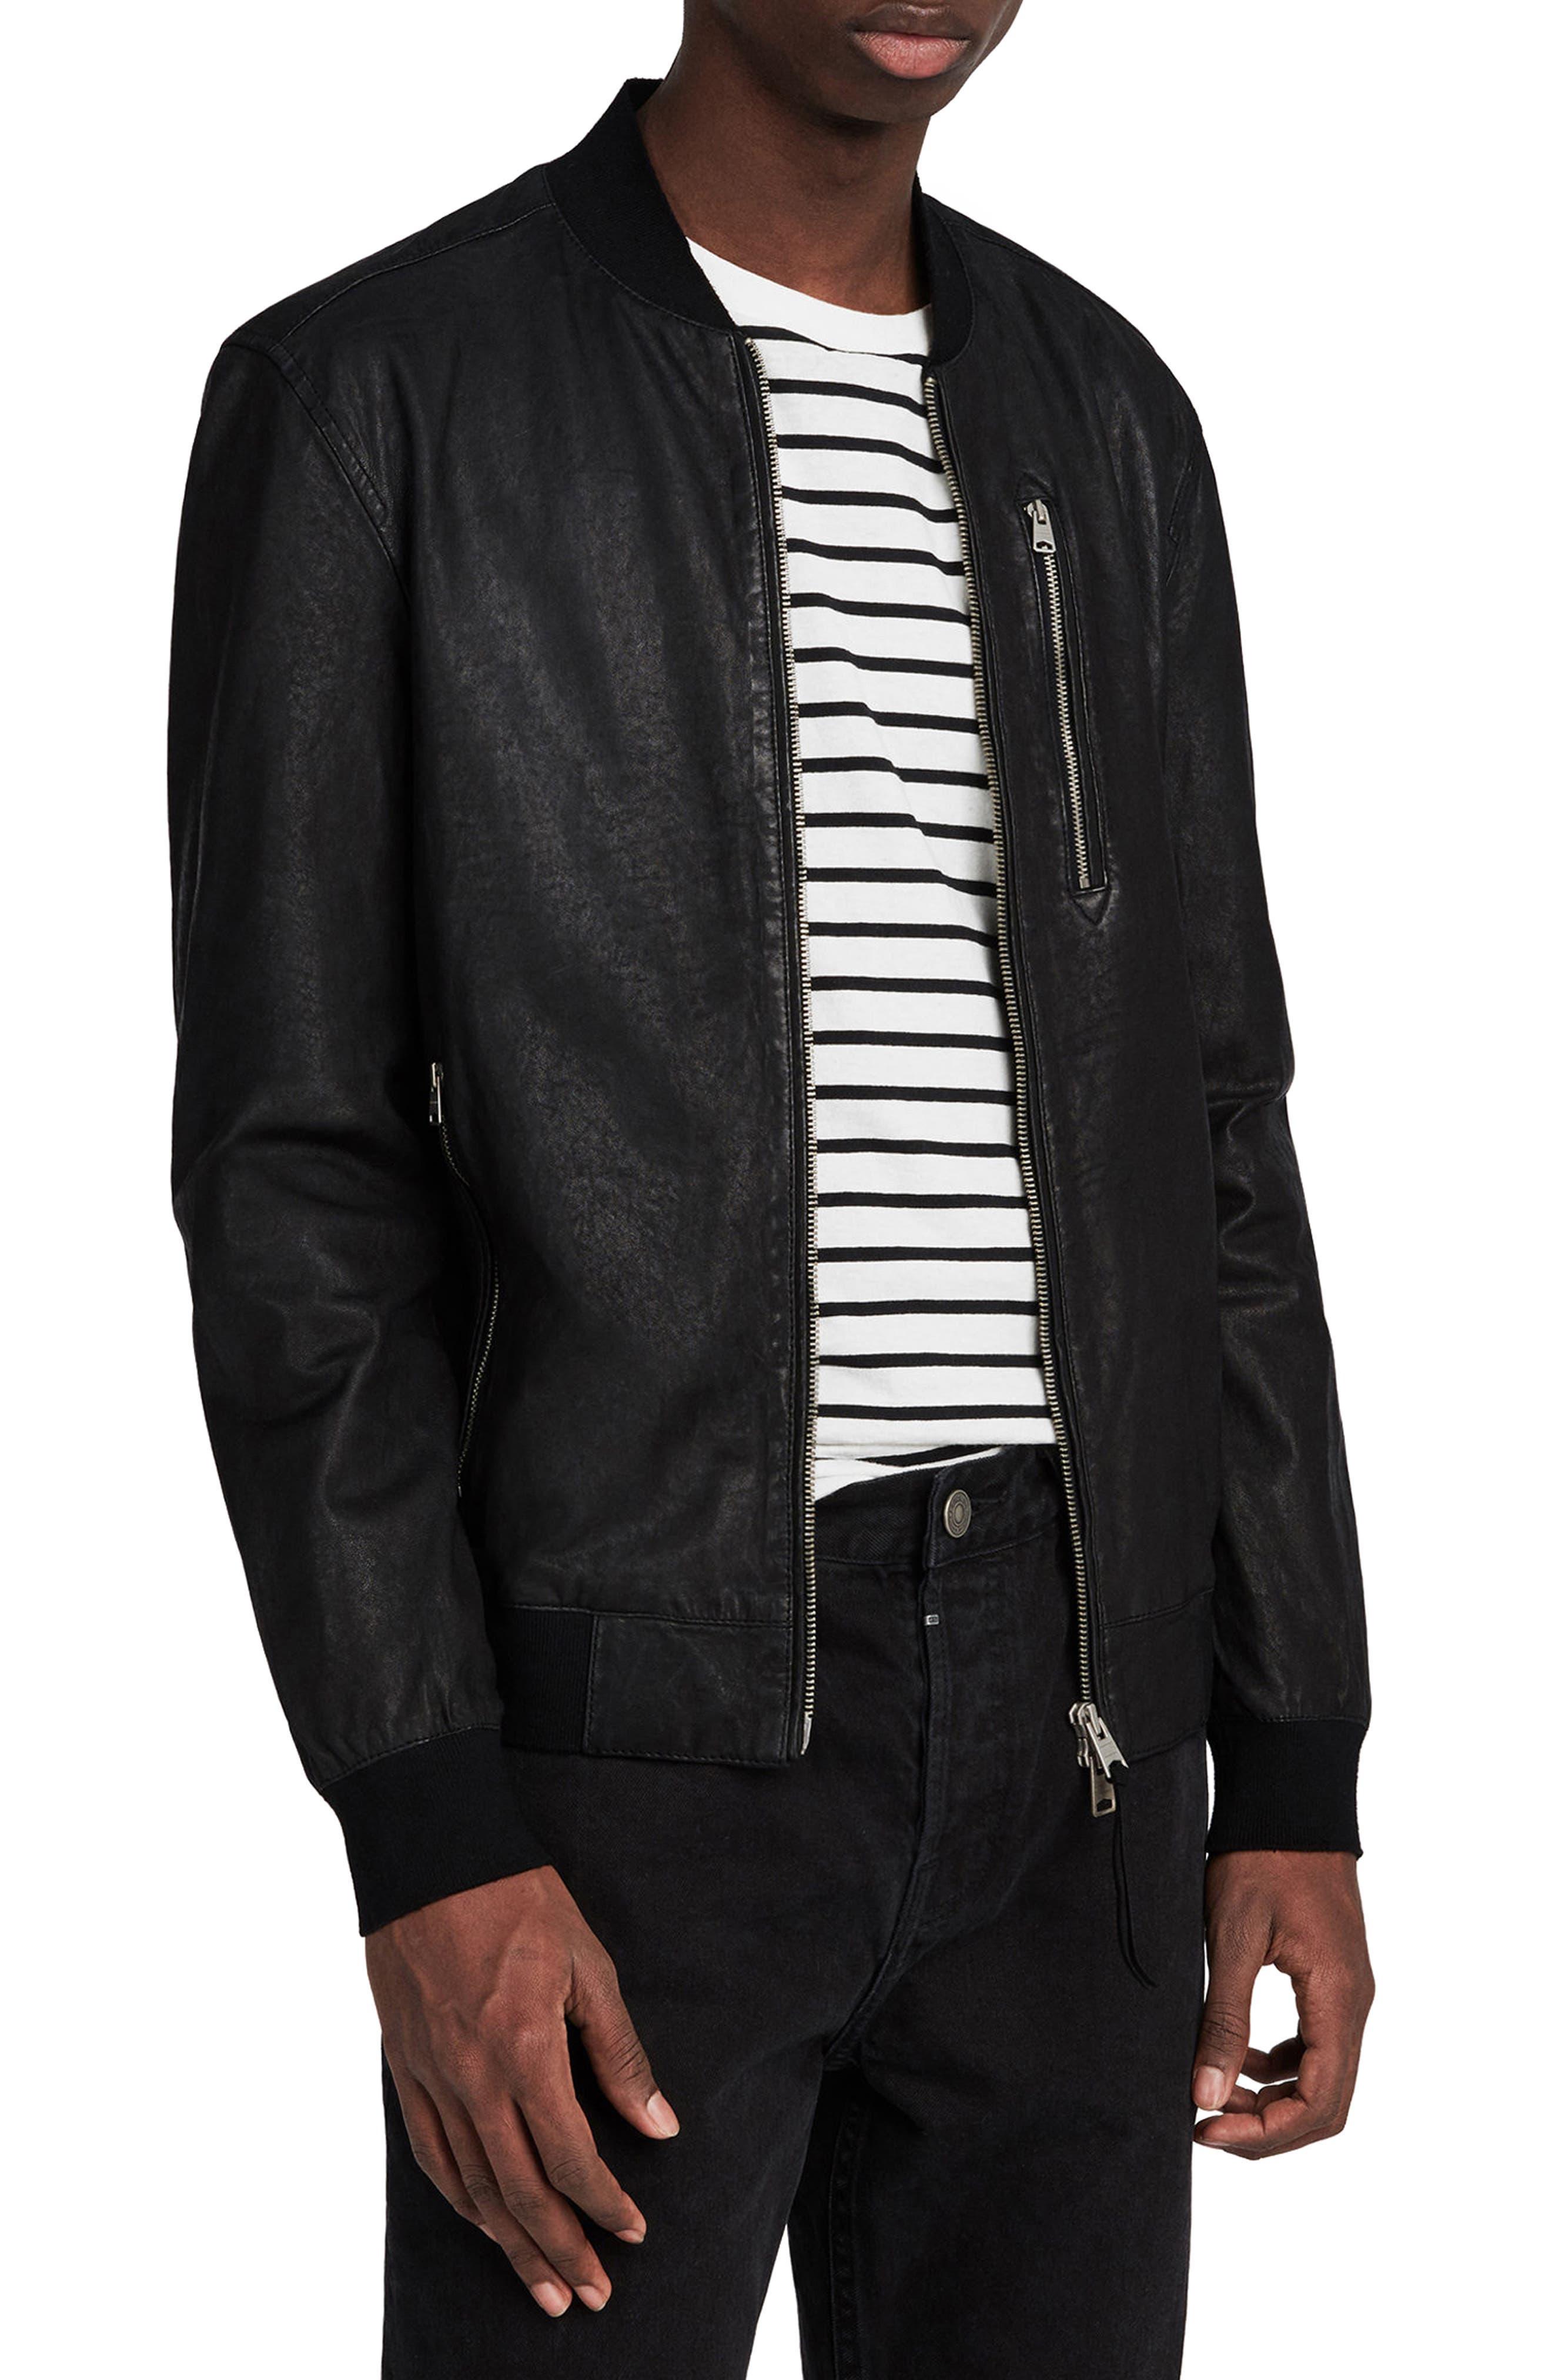 Kino Leather Bomber Jacket,                         Main,                         color, 001